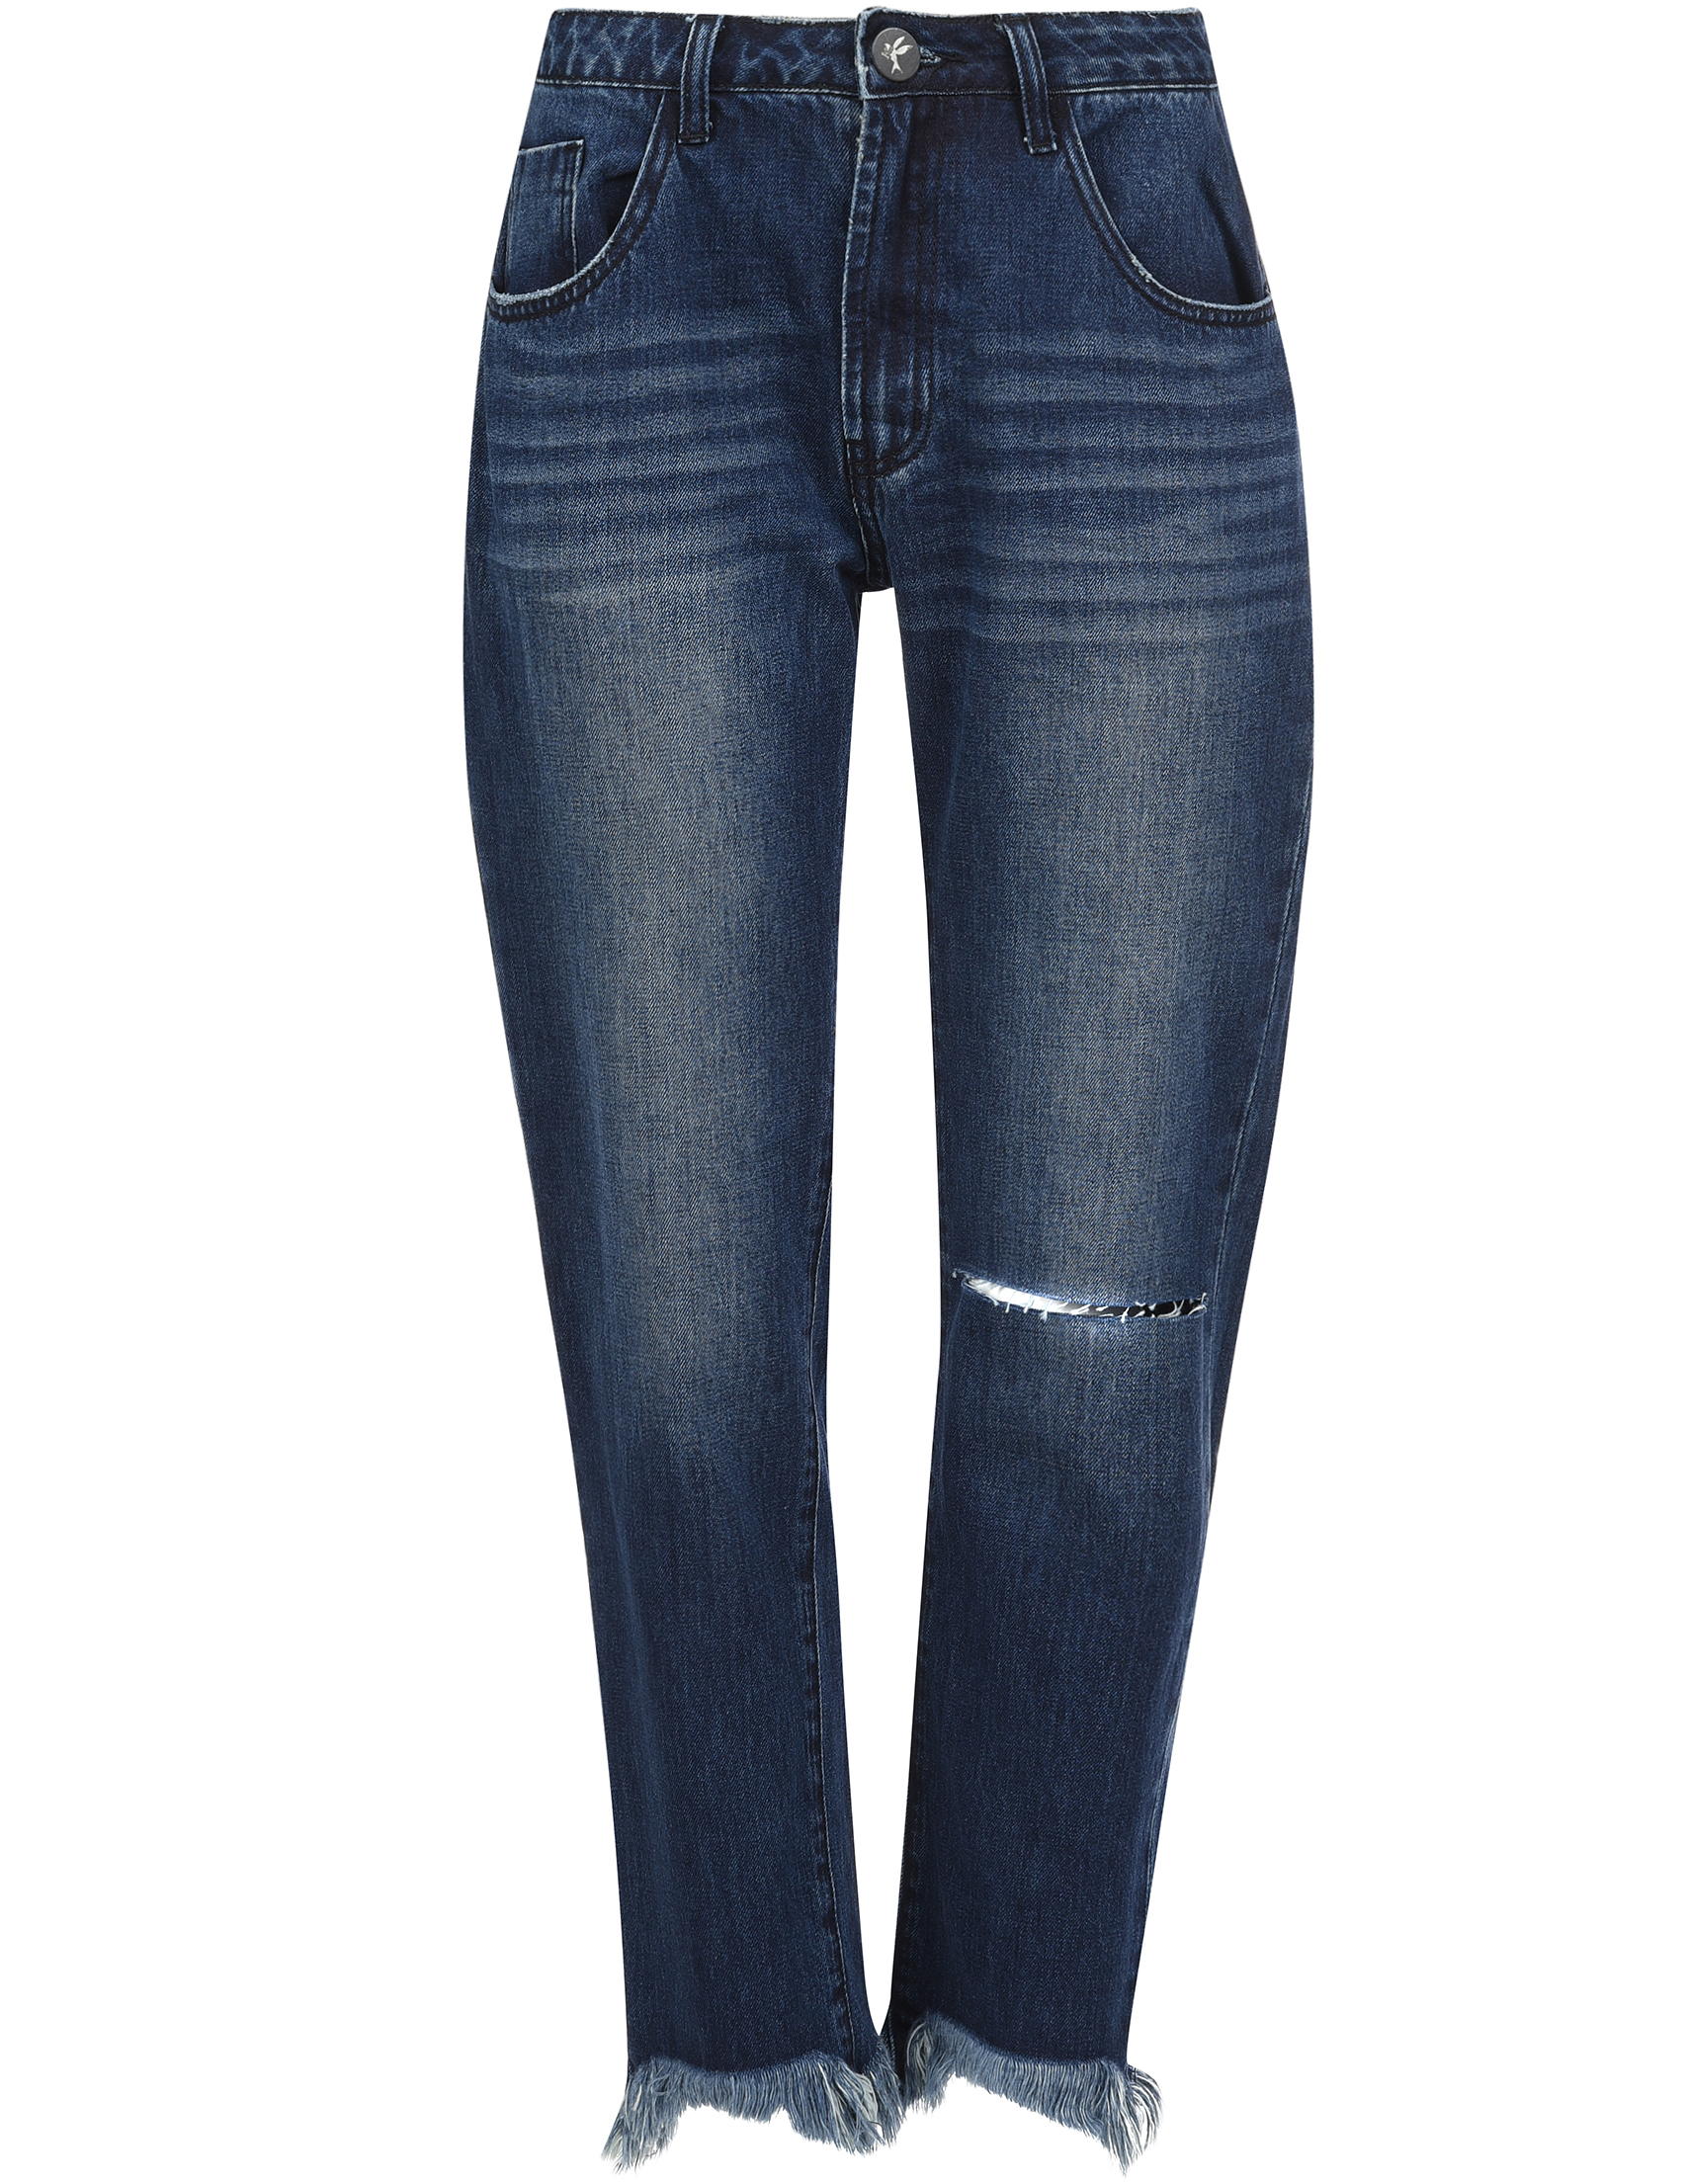 Женские джинсы ONETEASPOON 20970-ONE_blue